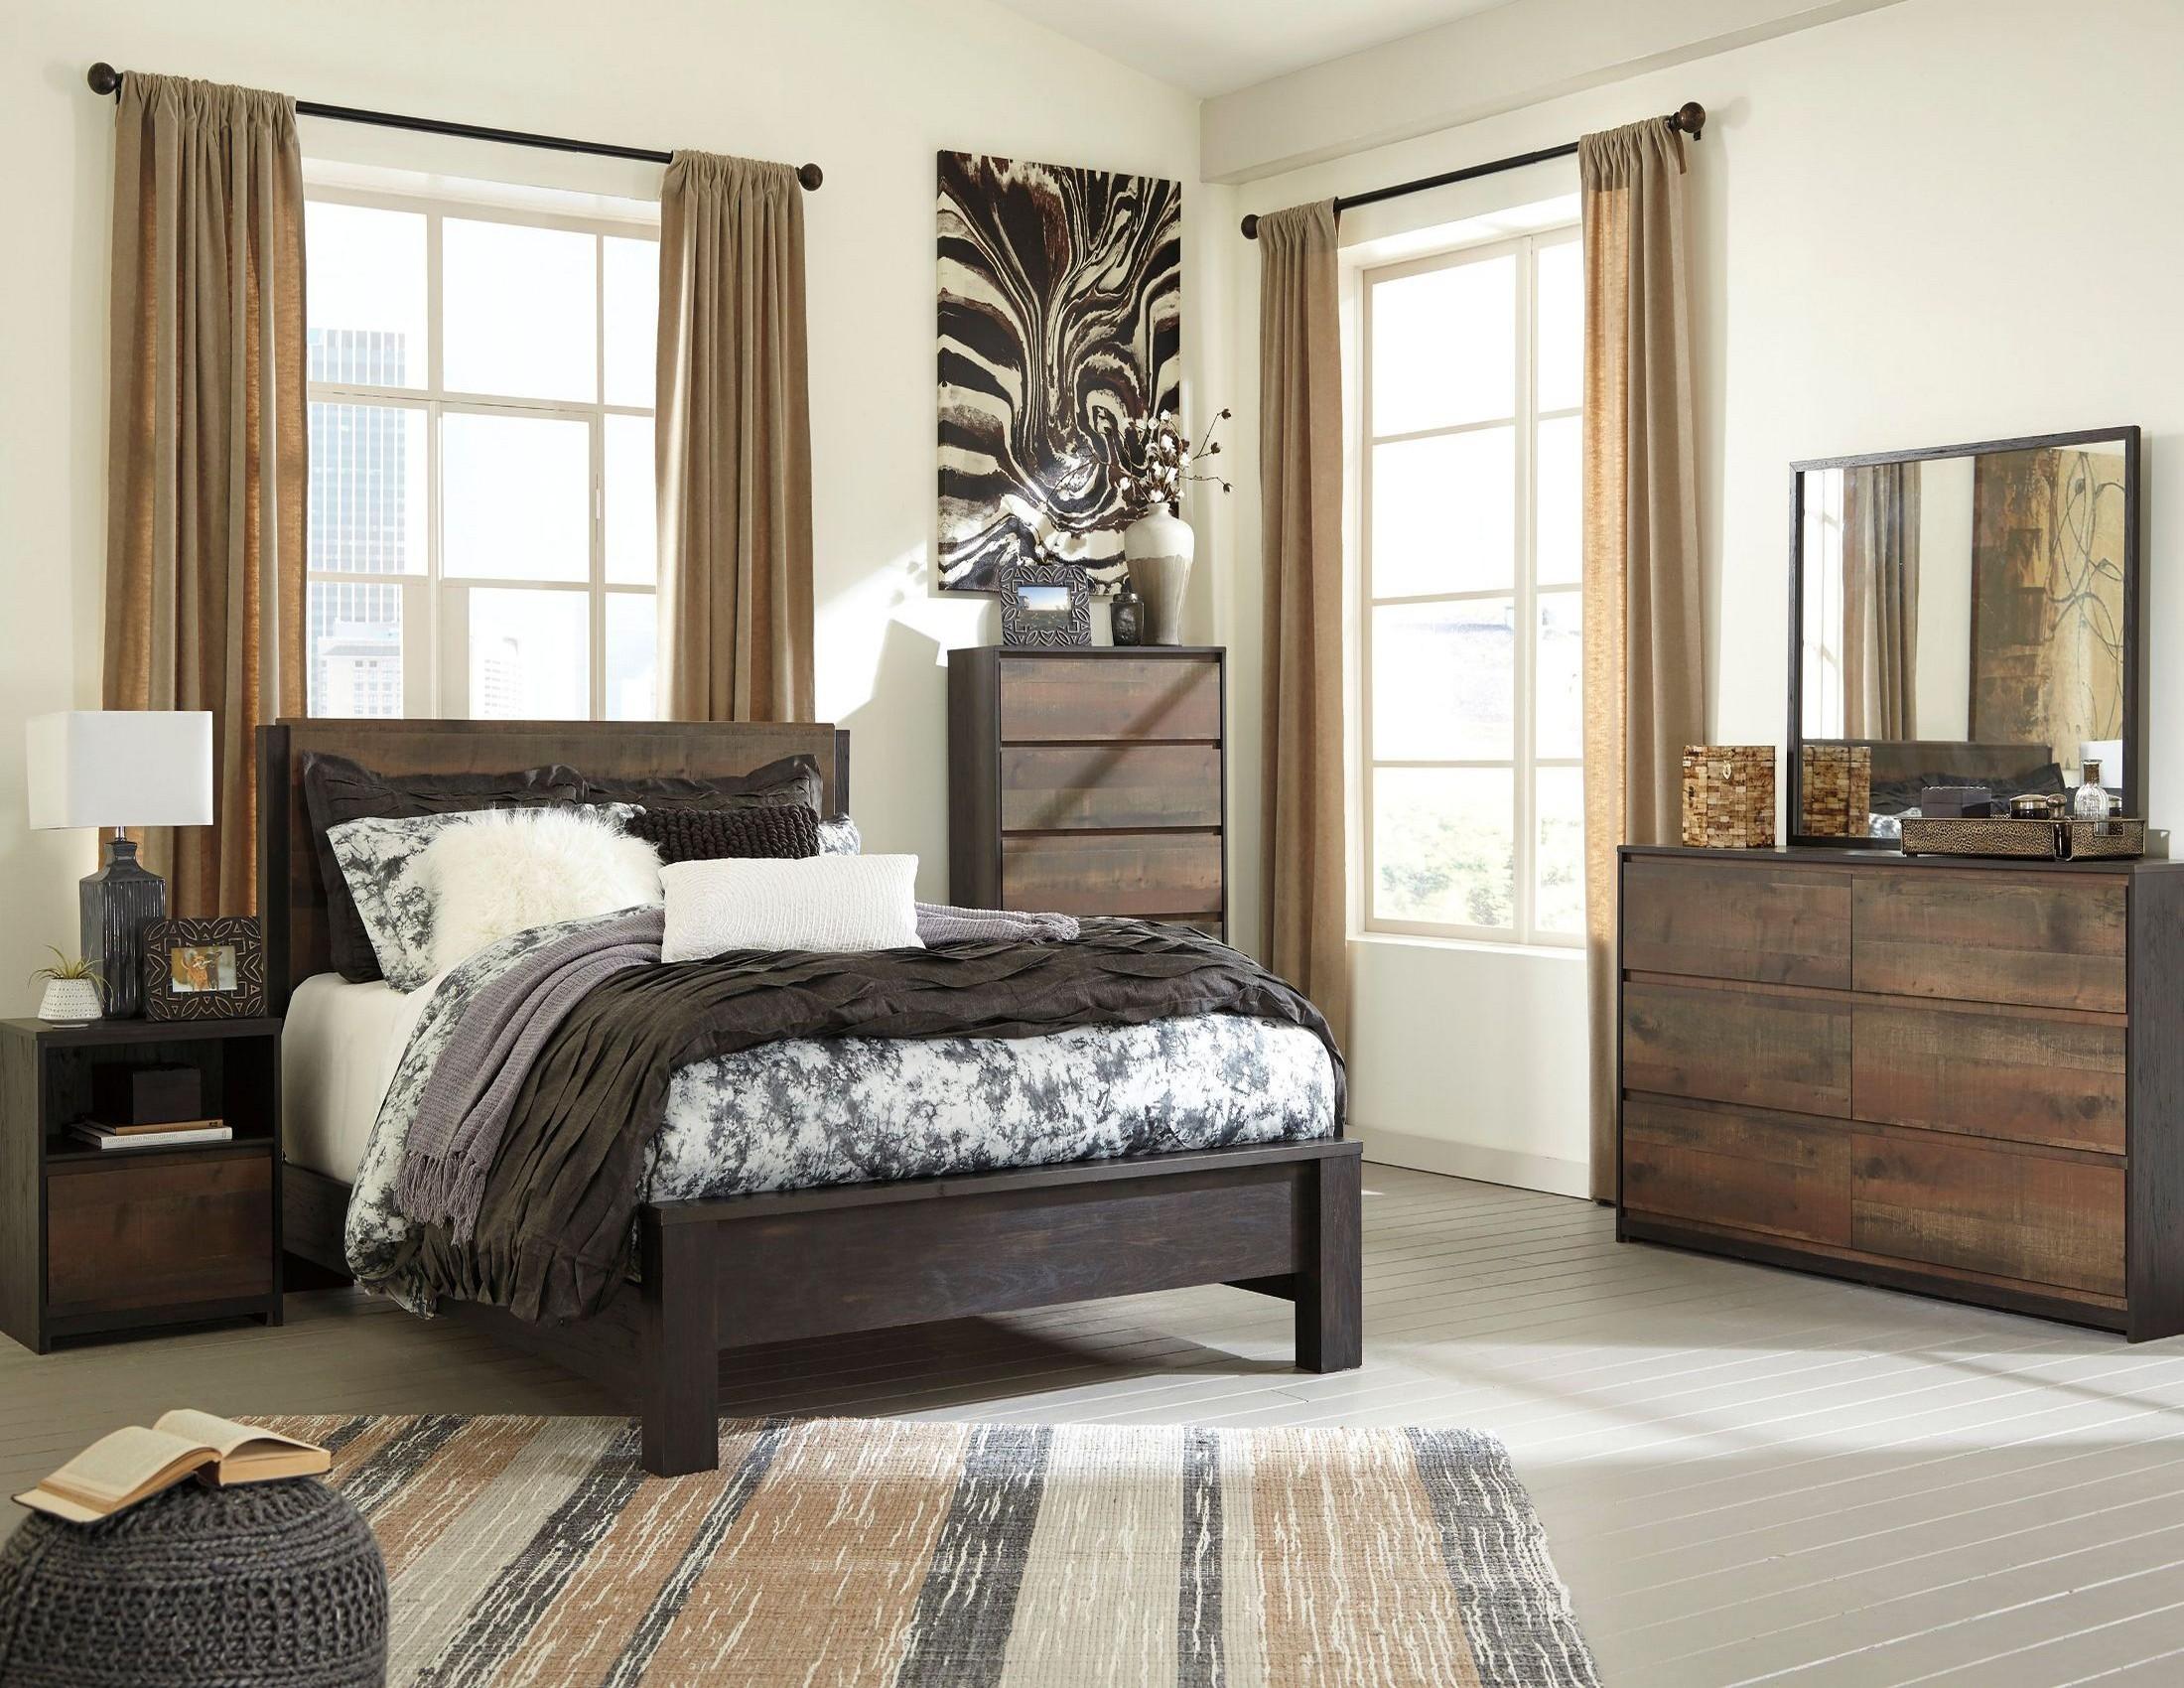 Windlore Dark Brown Panel Bedroom Set From Ashley